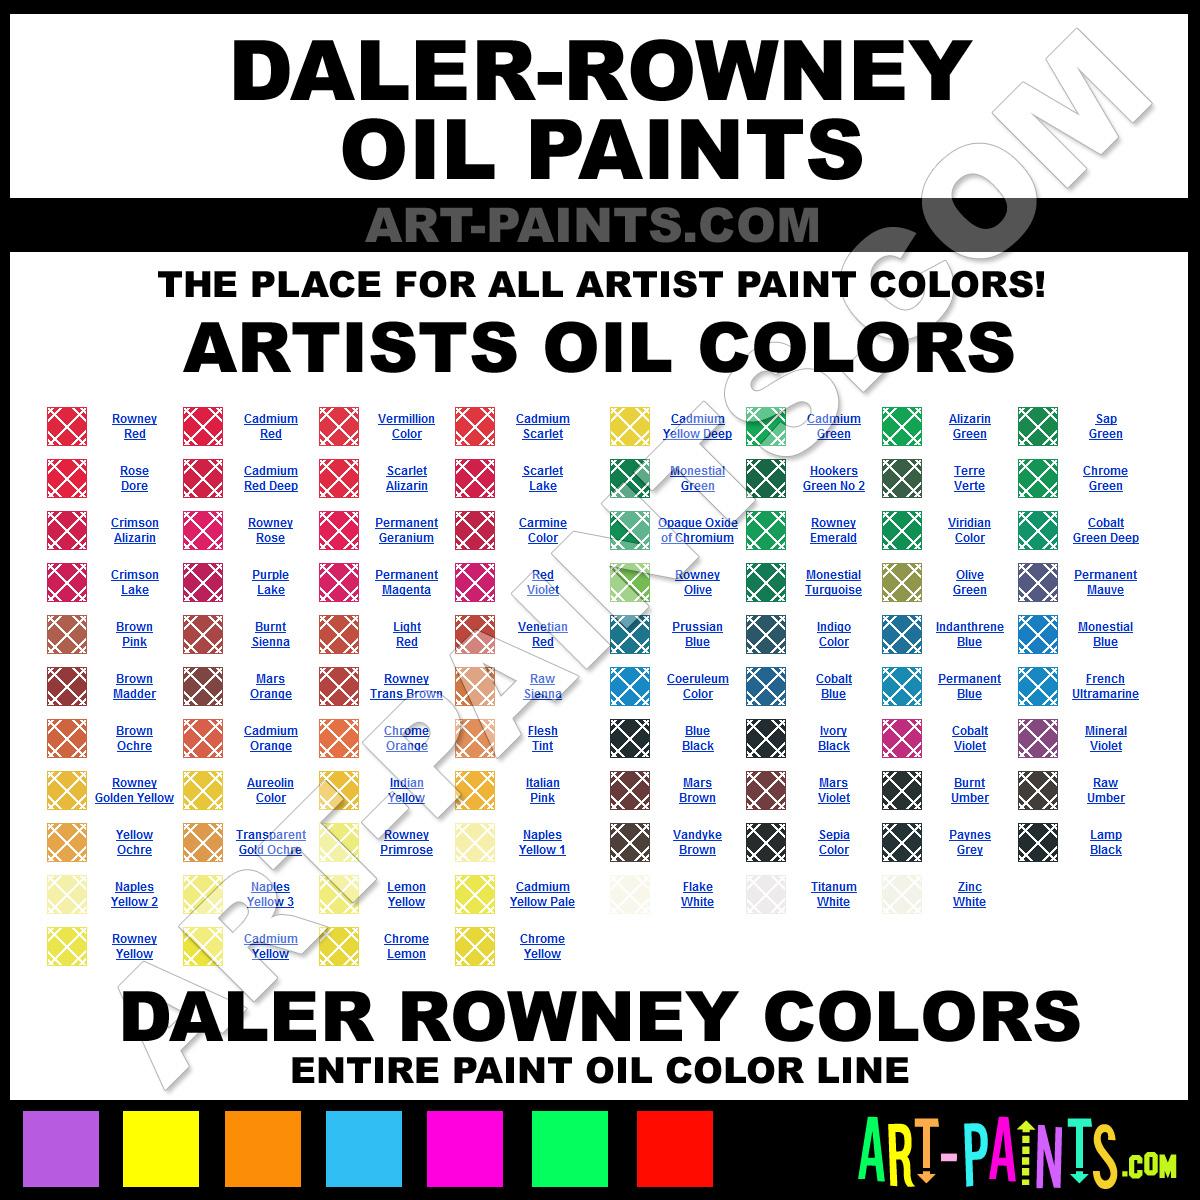 Paint Colors And Brands: Daler-Rowney Oil Paint Brands